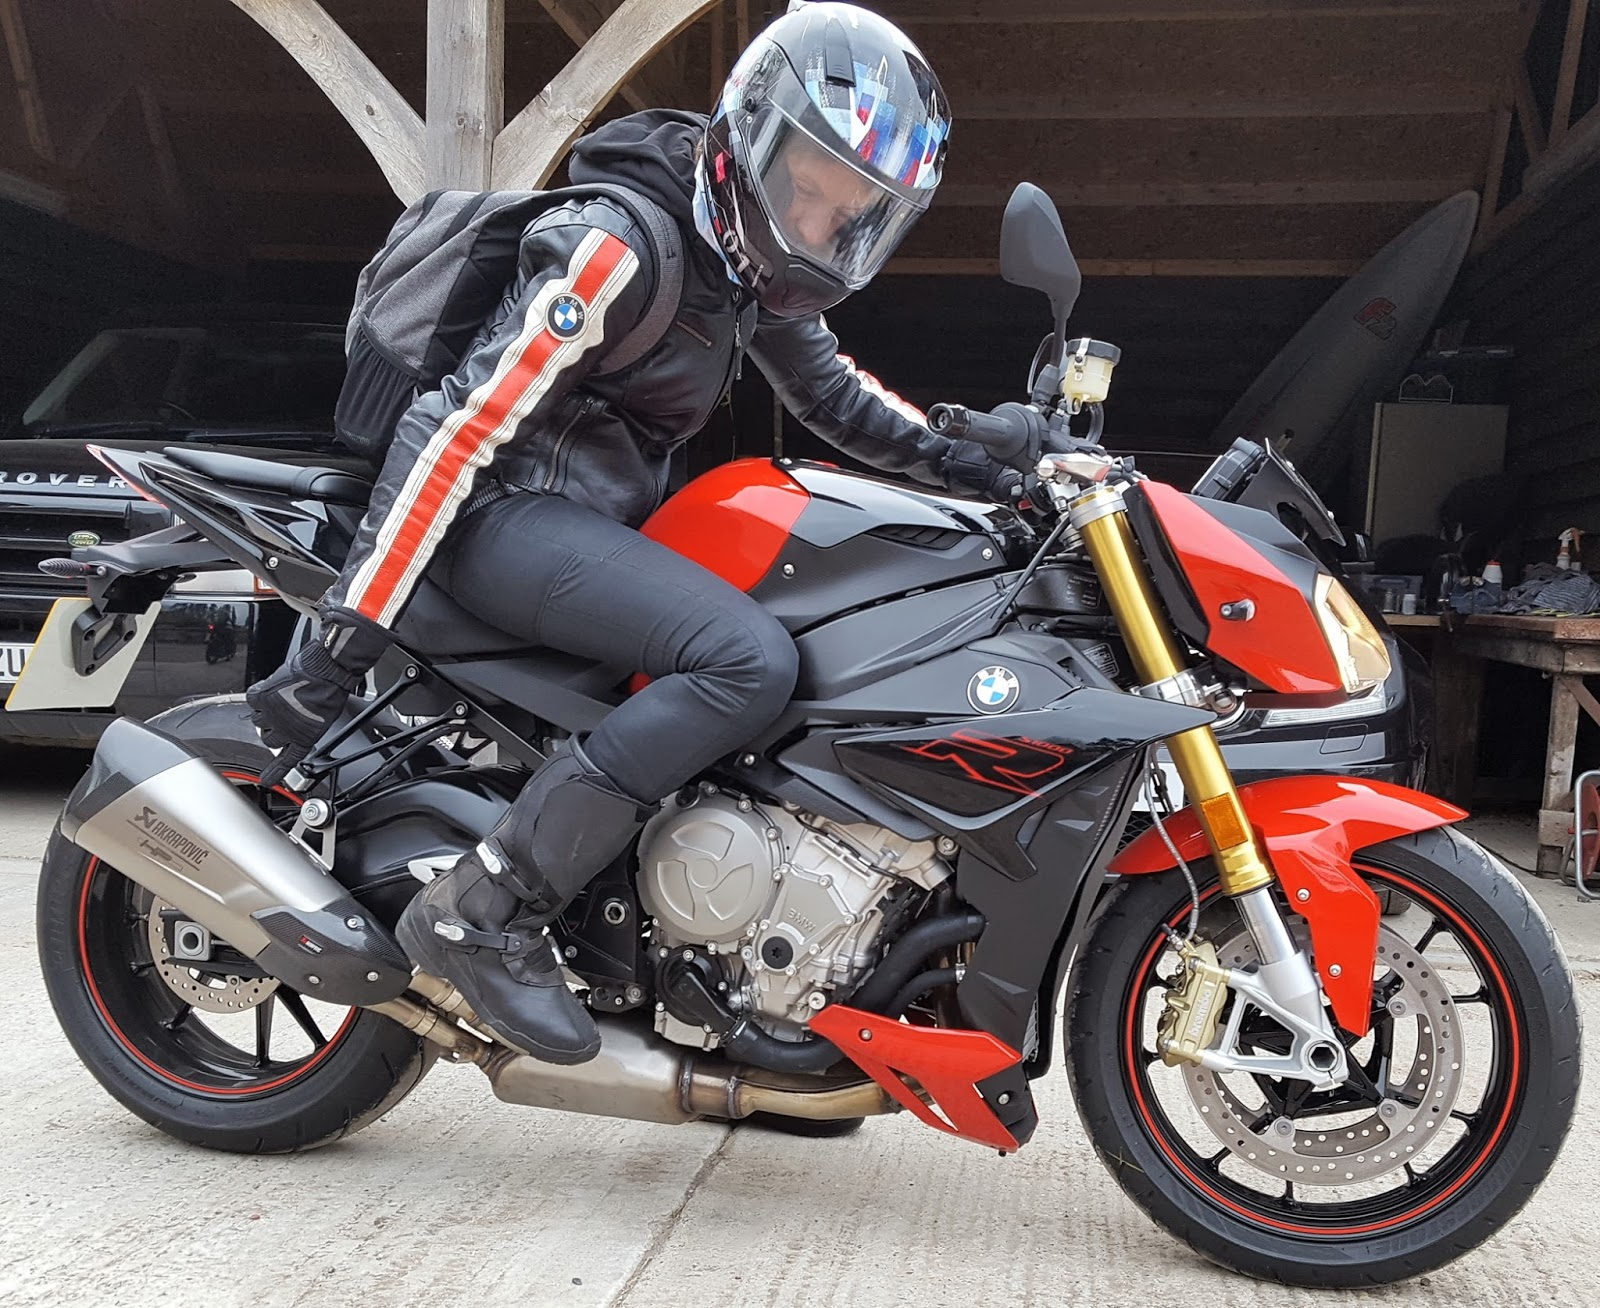 European Motorcycle Diaries: BMW S1000R Ride Review